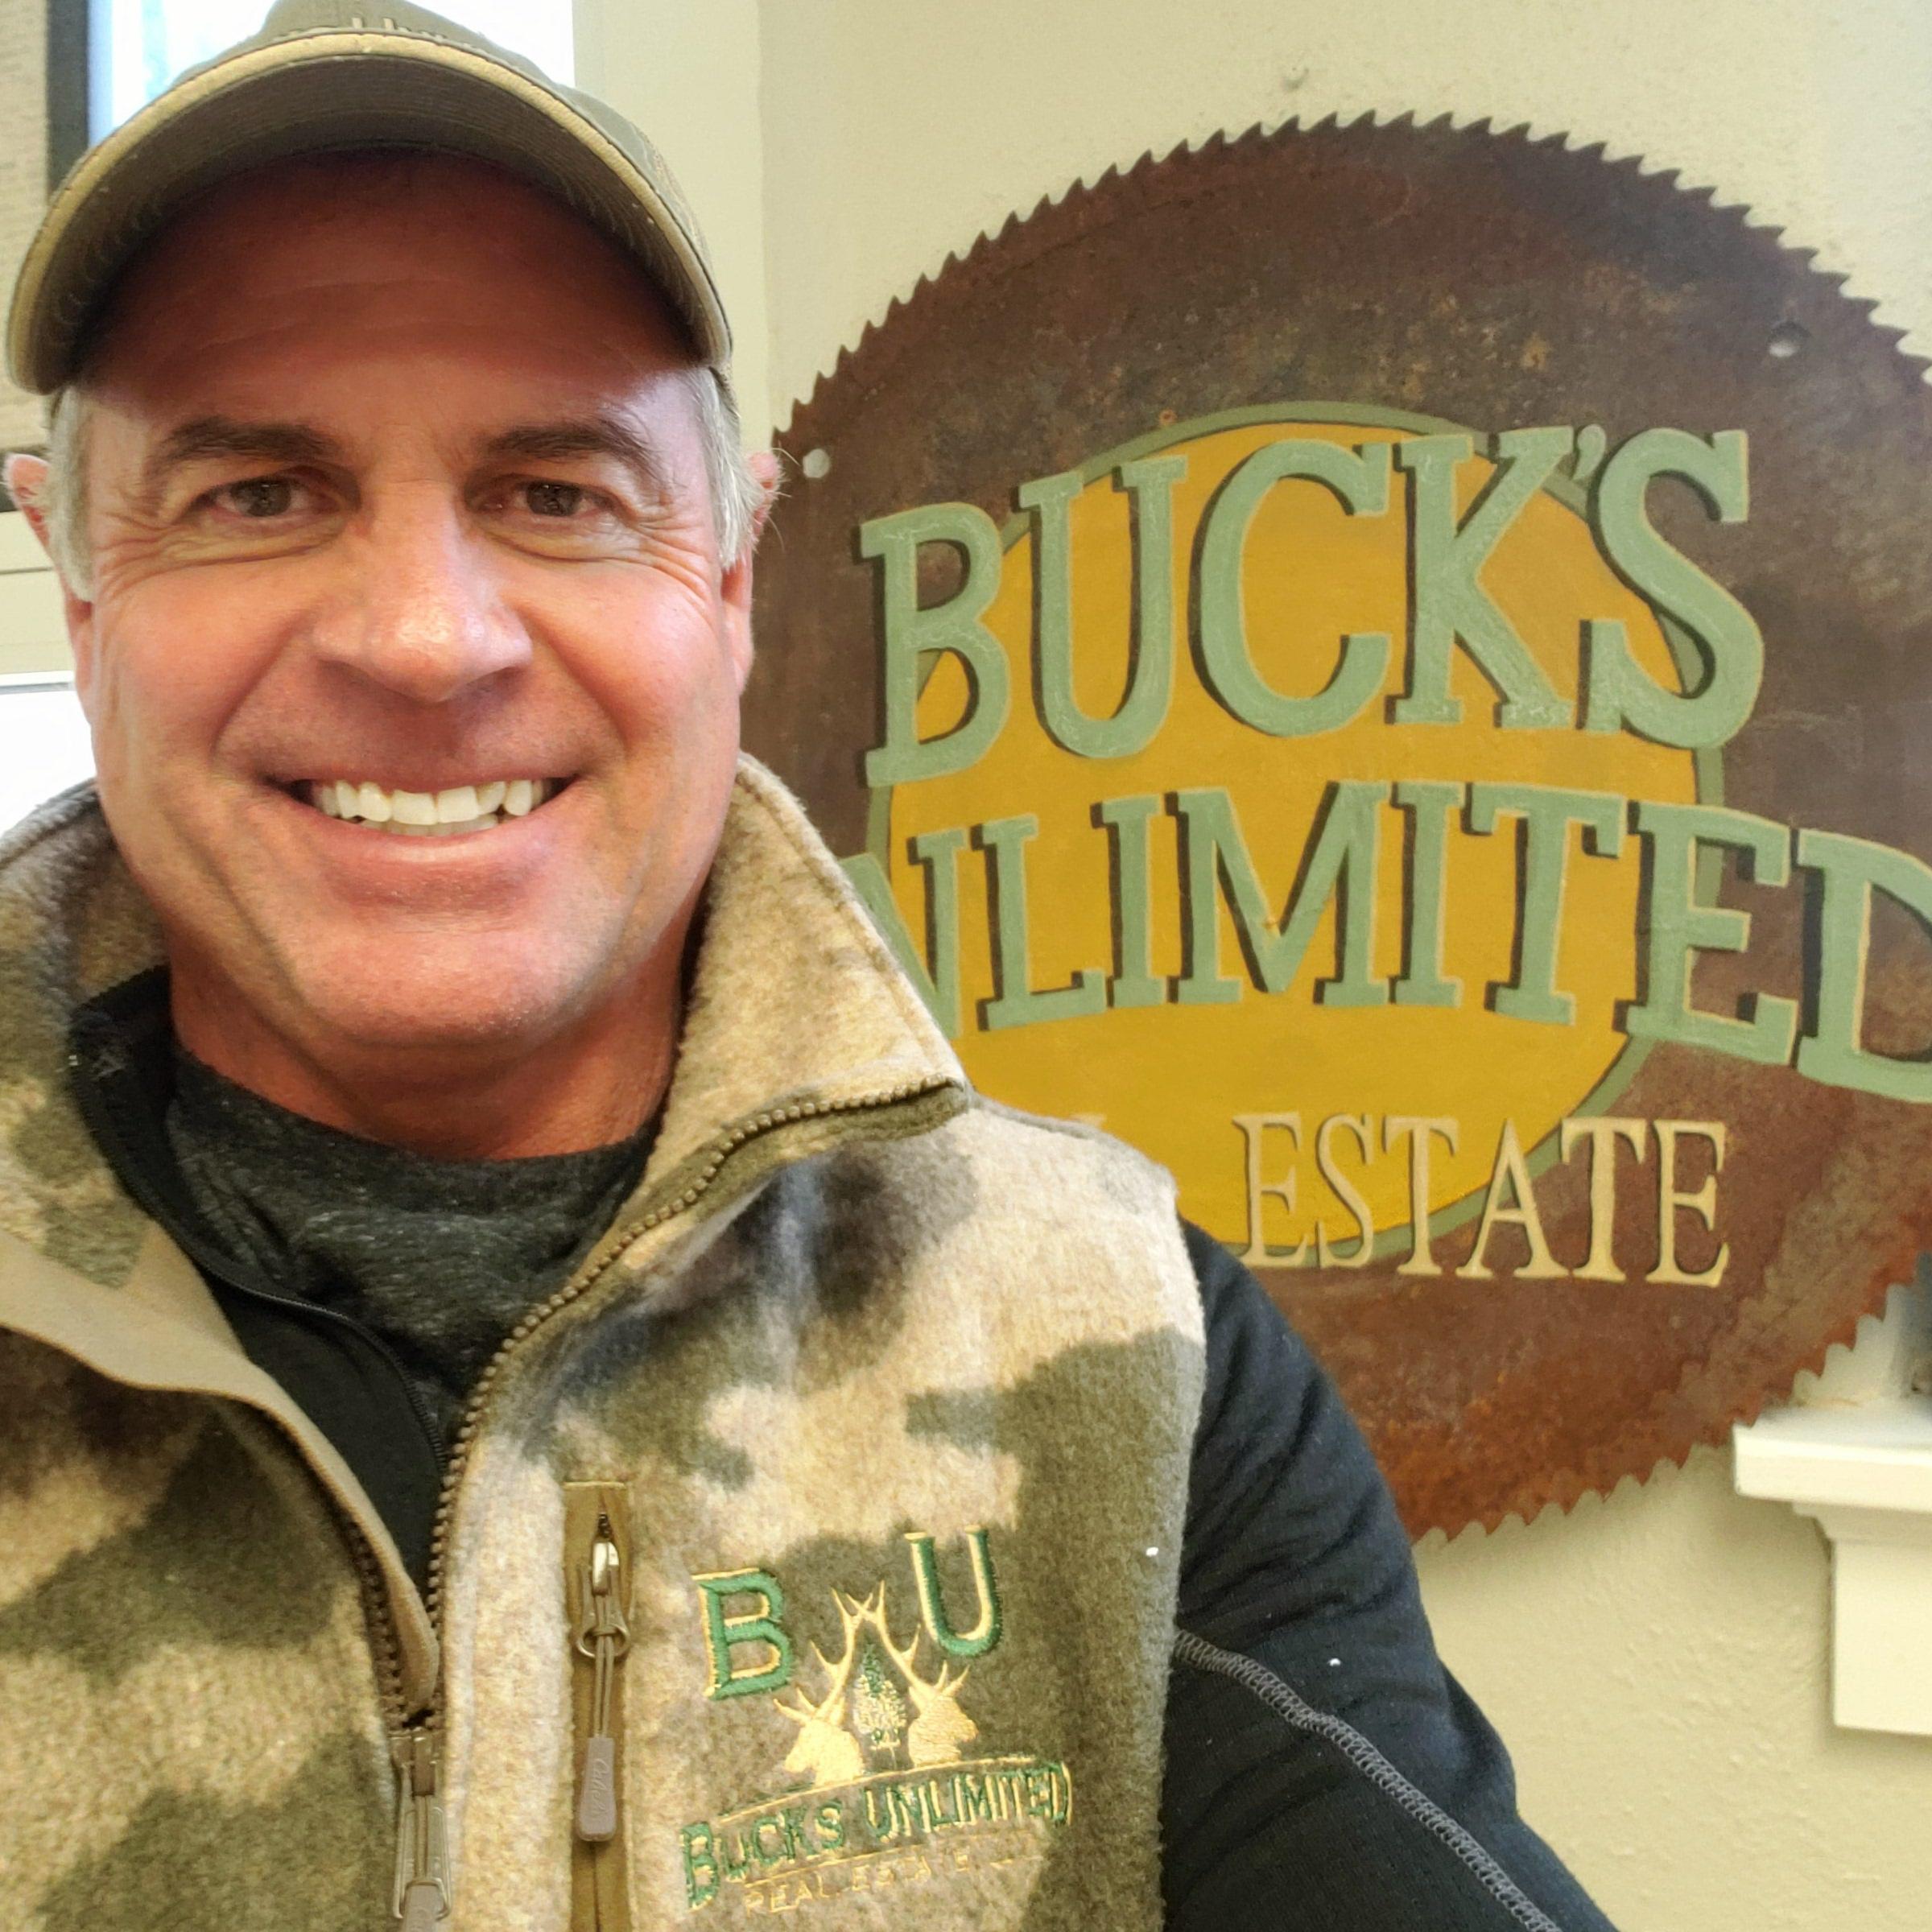 mark-buck-bucks-unlimited-real-estate-sign-cropped.jpeg